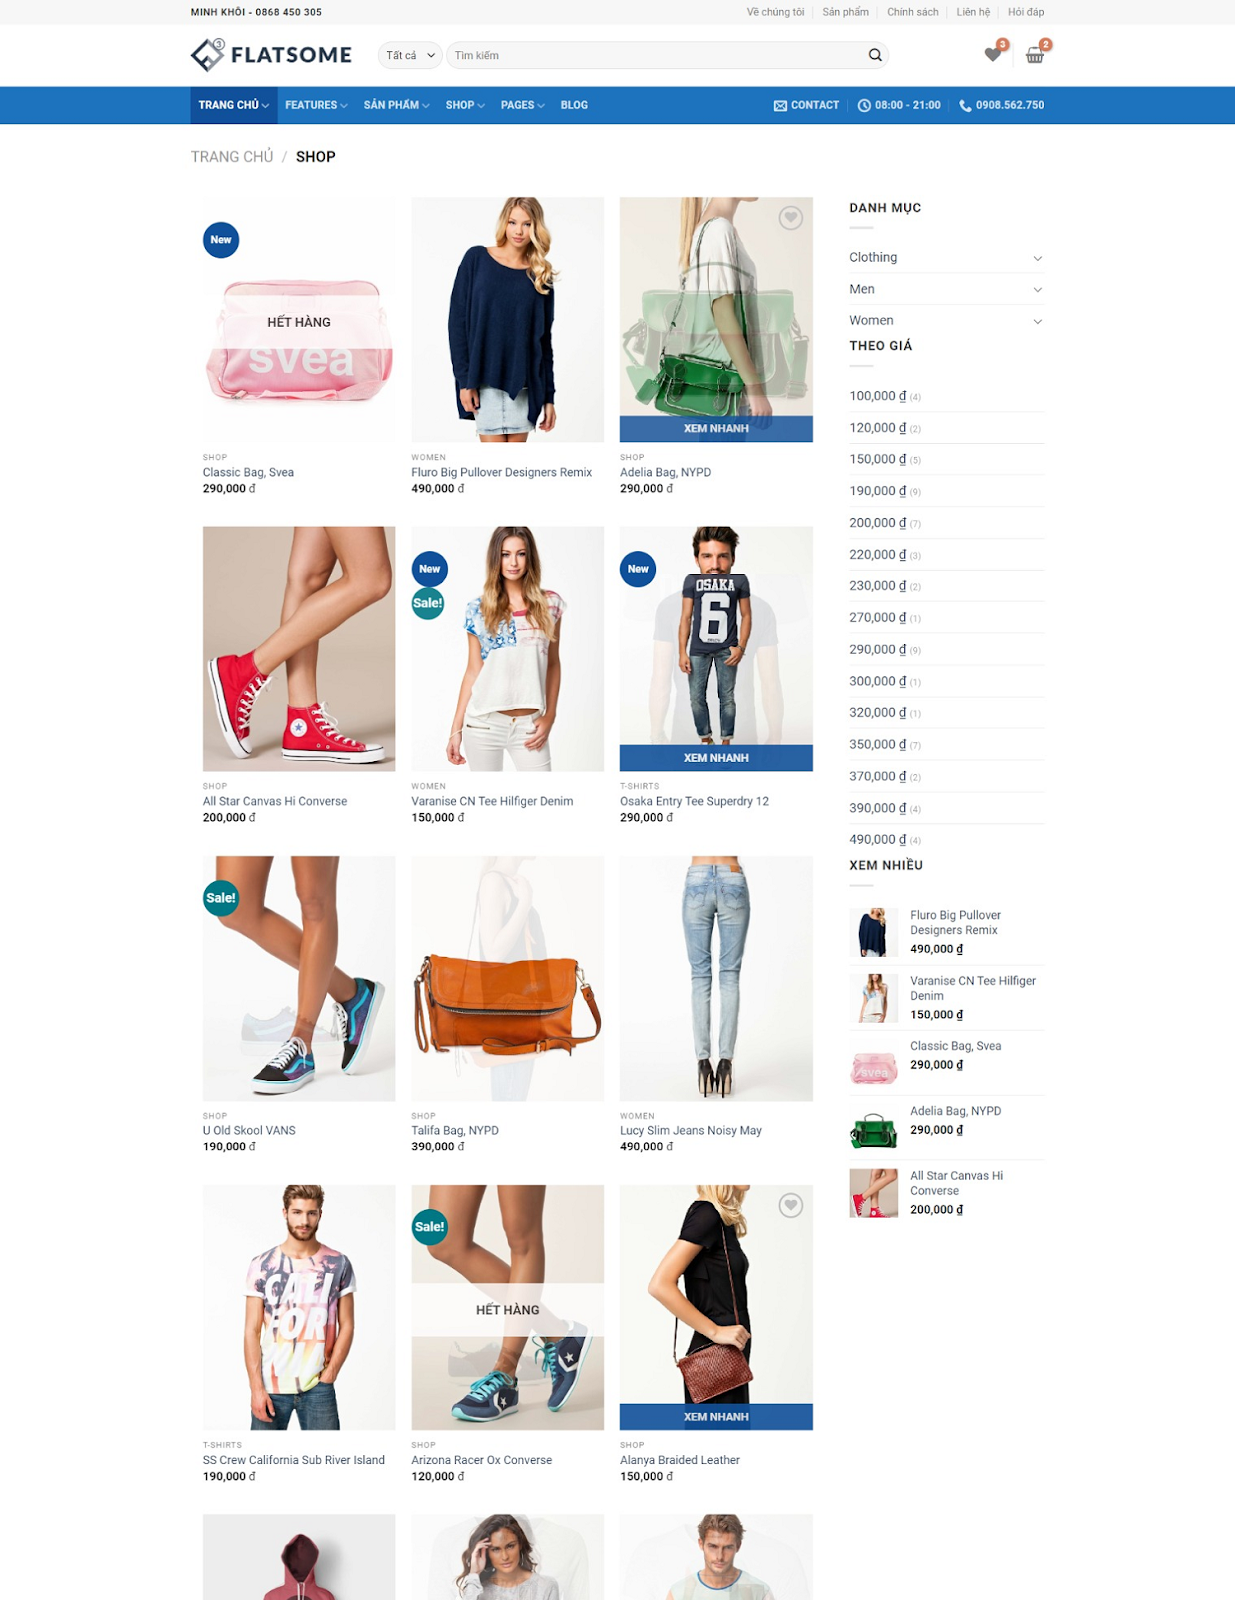 Template blogspot bán hàng cao cấp Flatsome - Giaodienblog.com